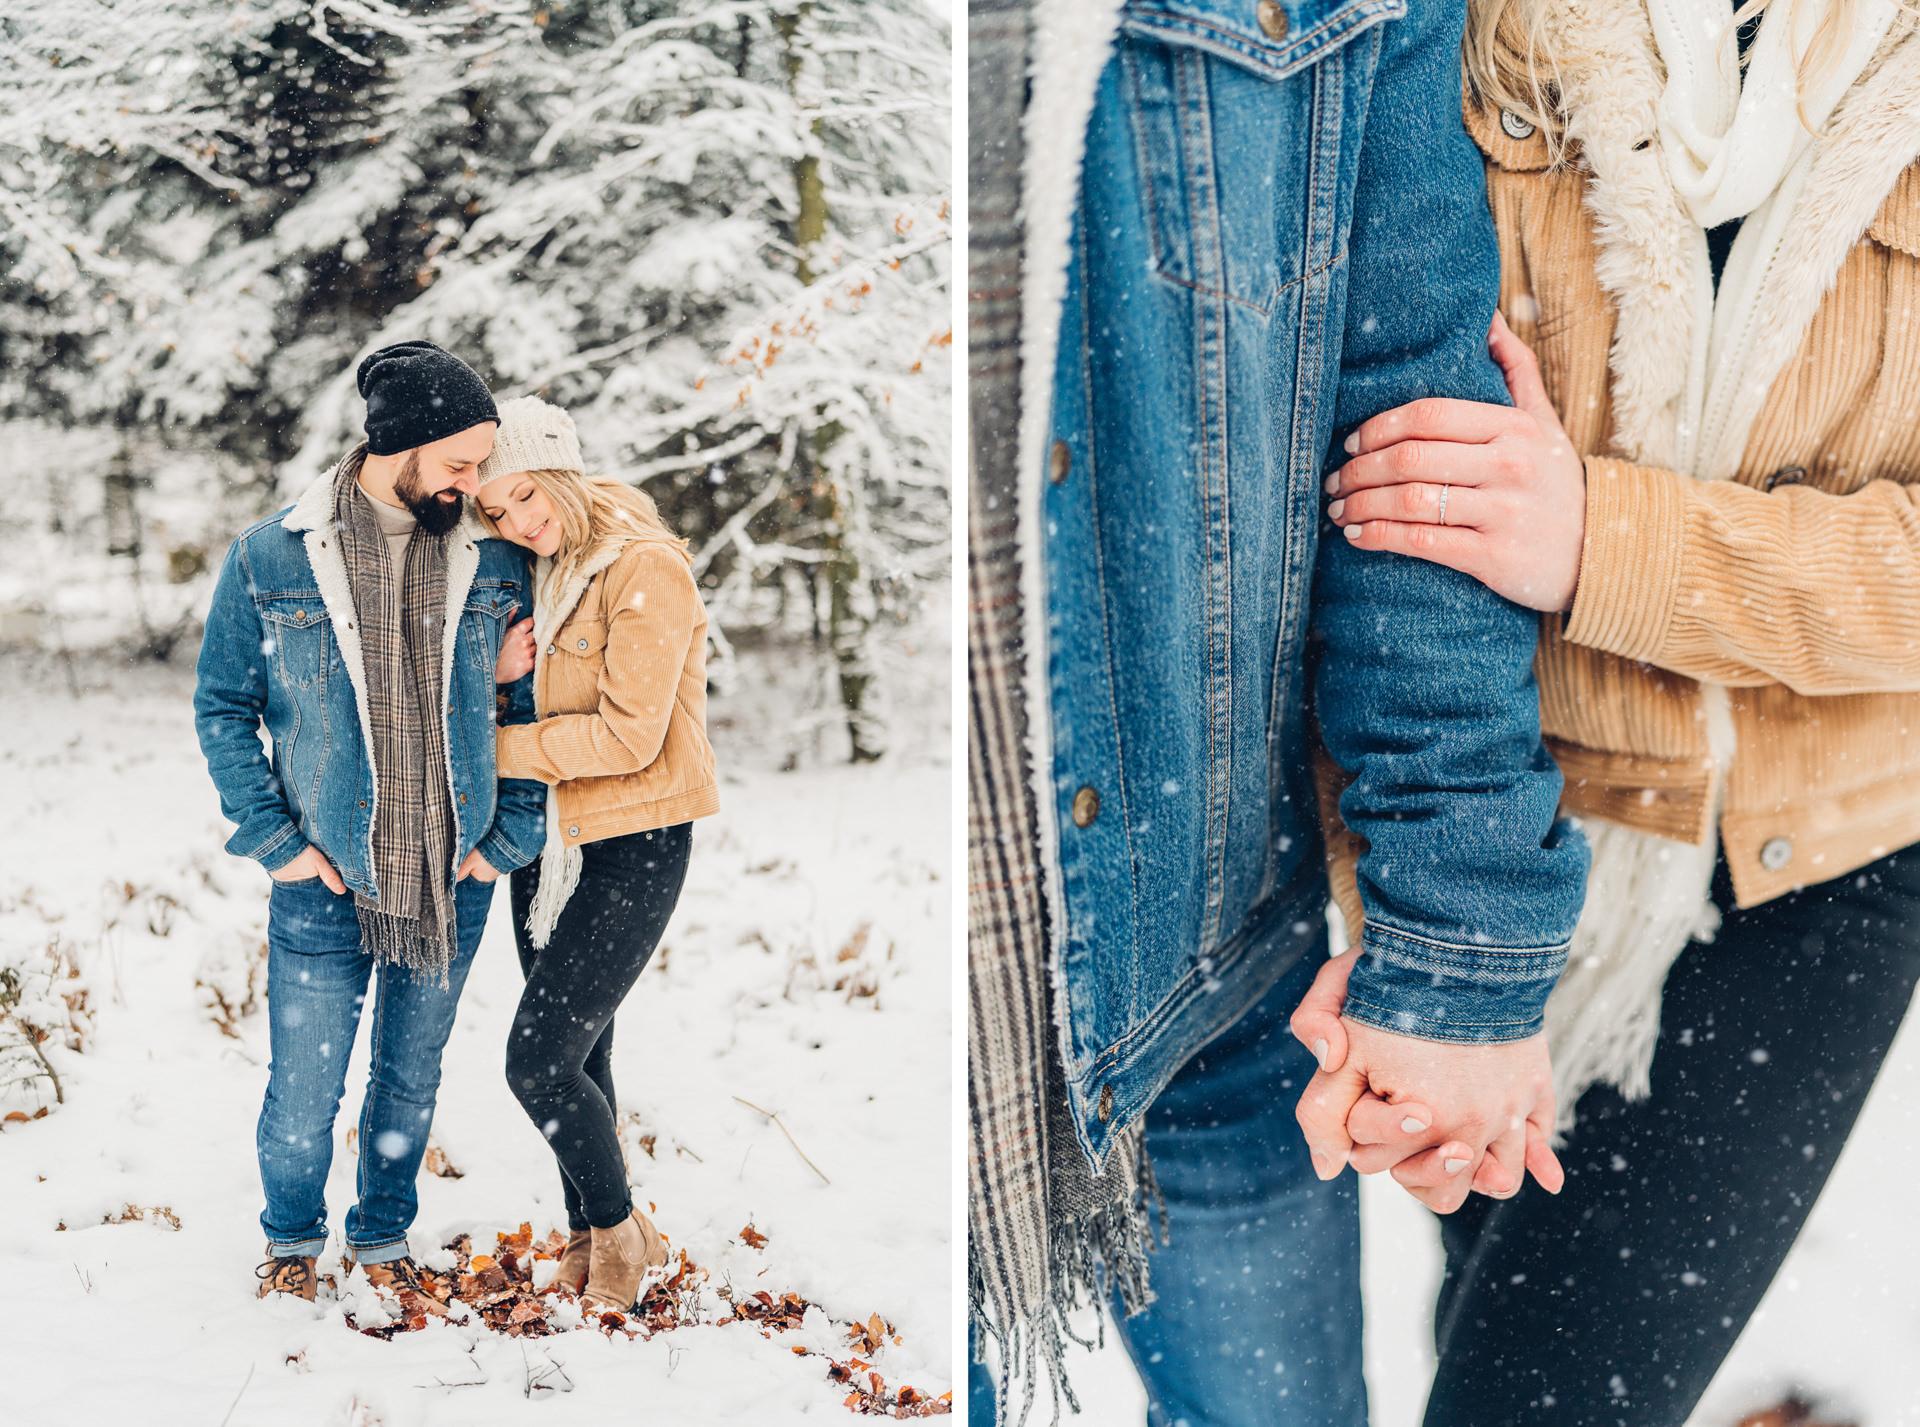 Paarfotoshooting im Schnee